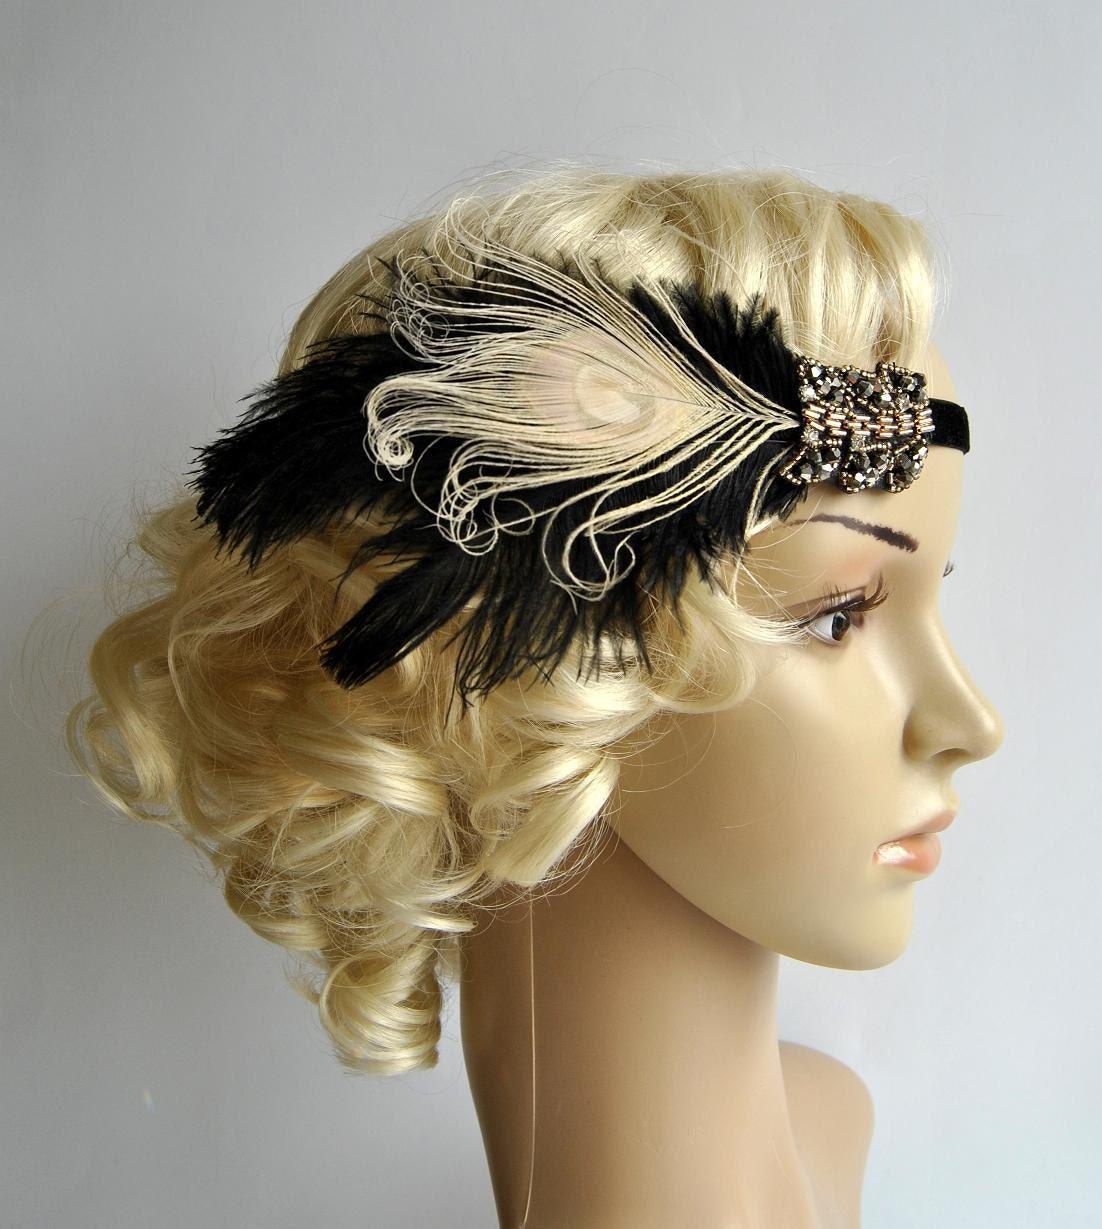 Ivory White Ostrich Feather Headpiece 1920s Headband Flapper Great Gatbsy 4247